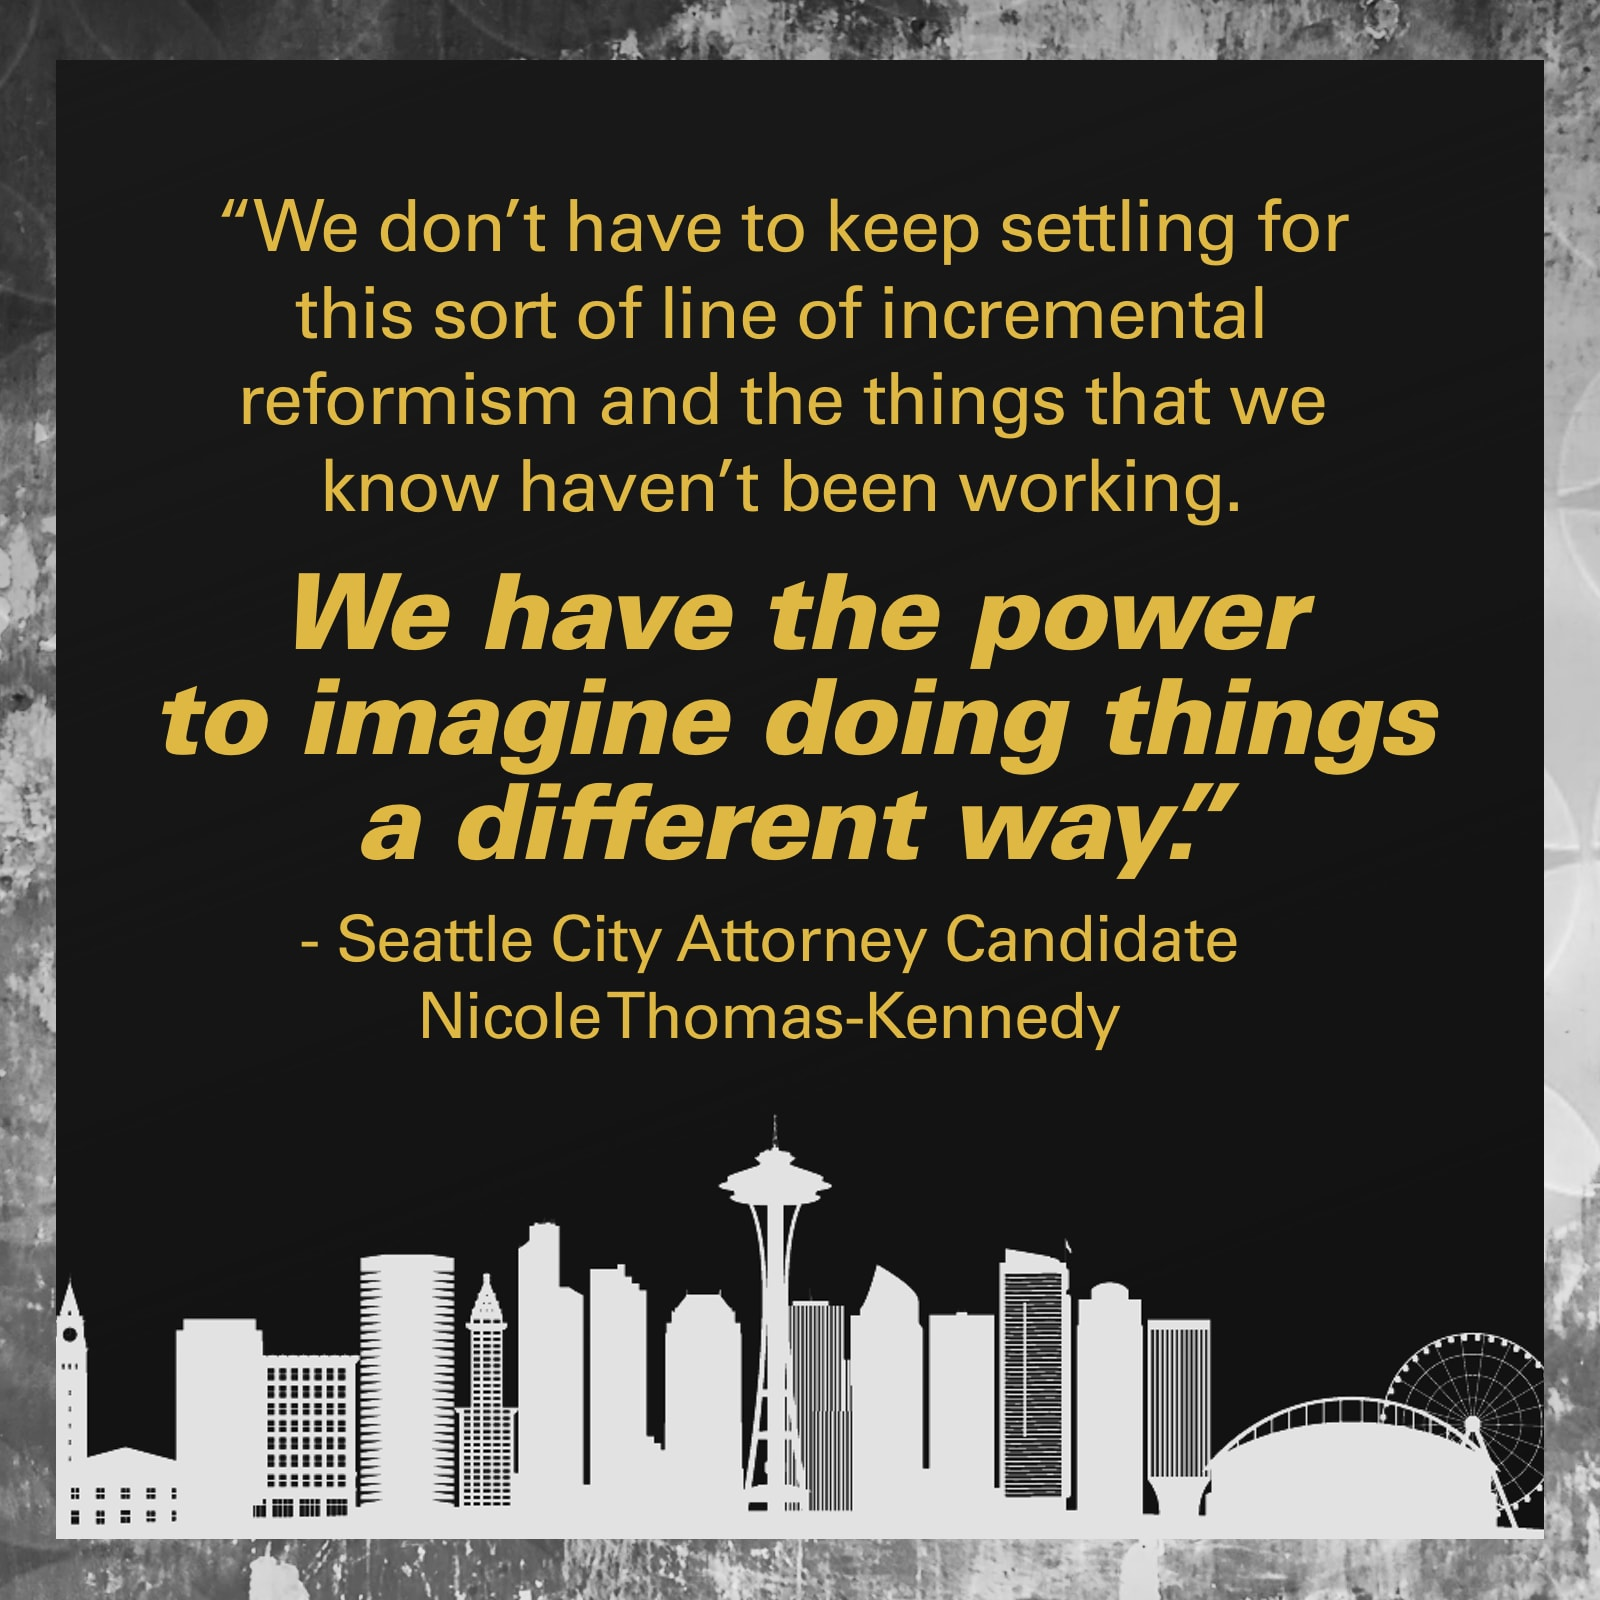 Team Diva Endorses Nicole Thomas-Kennedy for Seattle City Attorney